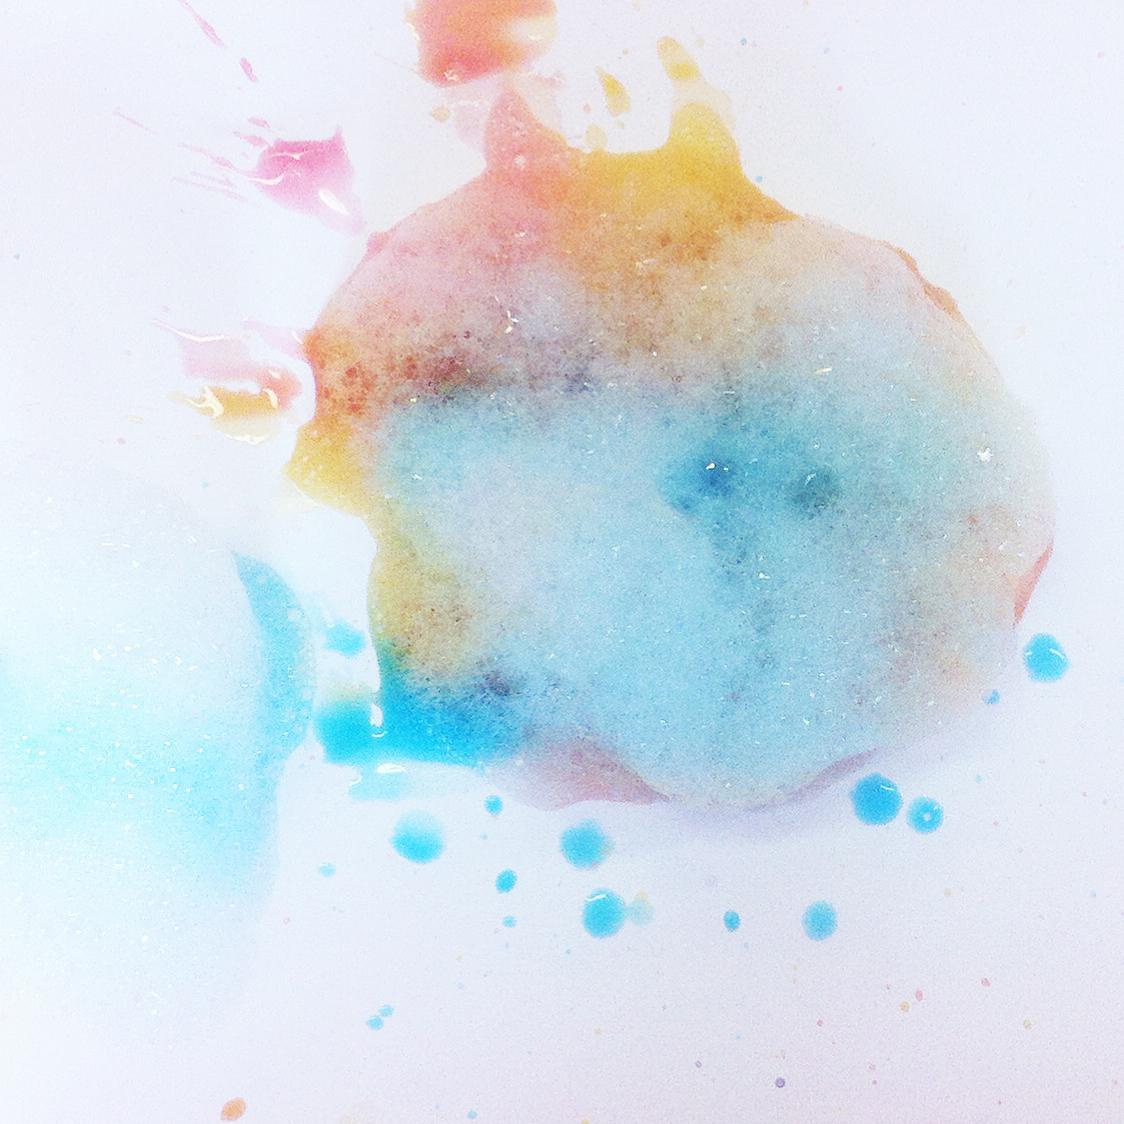 Kleurenmengen2.JPG